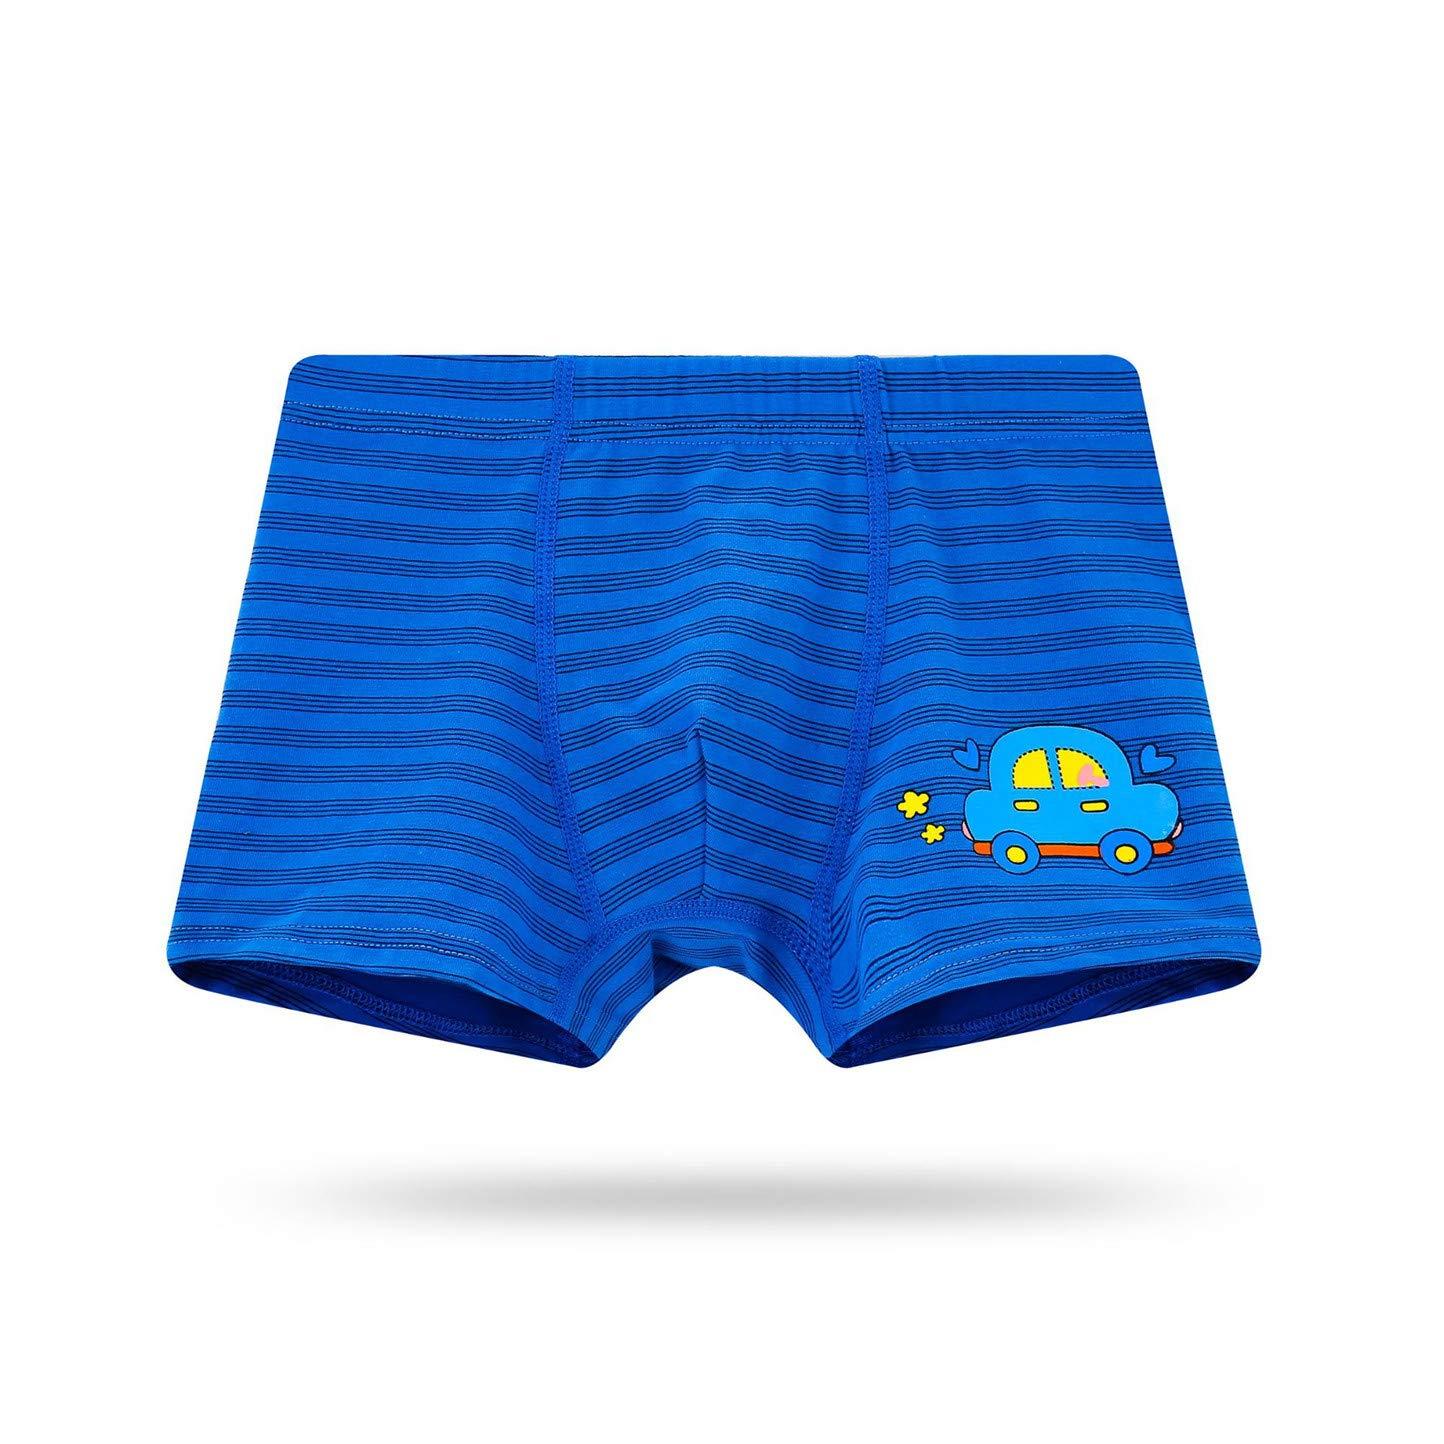 KK-Jim Little Boys Cartoon Boxers Briefs 3 Pack of Underwear for Toddlers,Teens